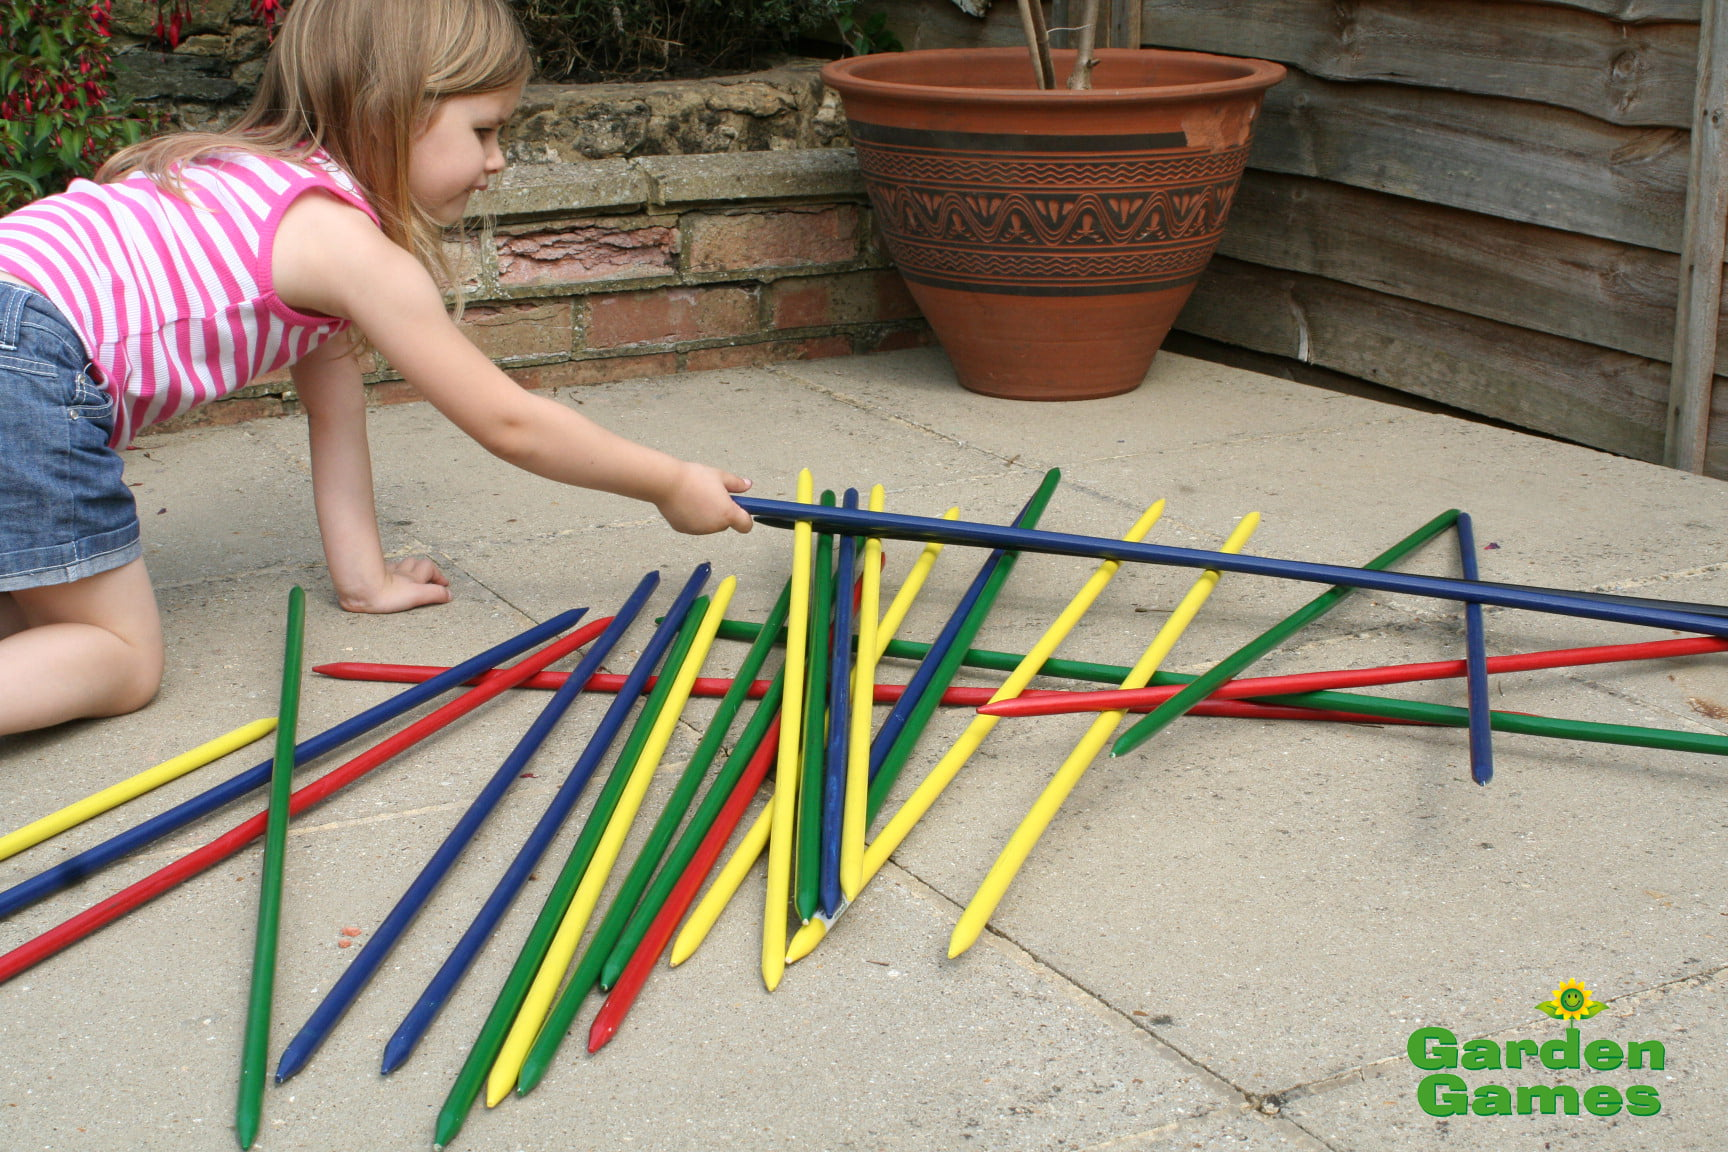 Adventure Zone Toys Garden Games Giant Pick Up Sticks